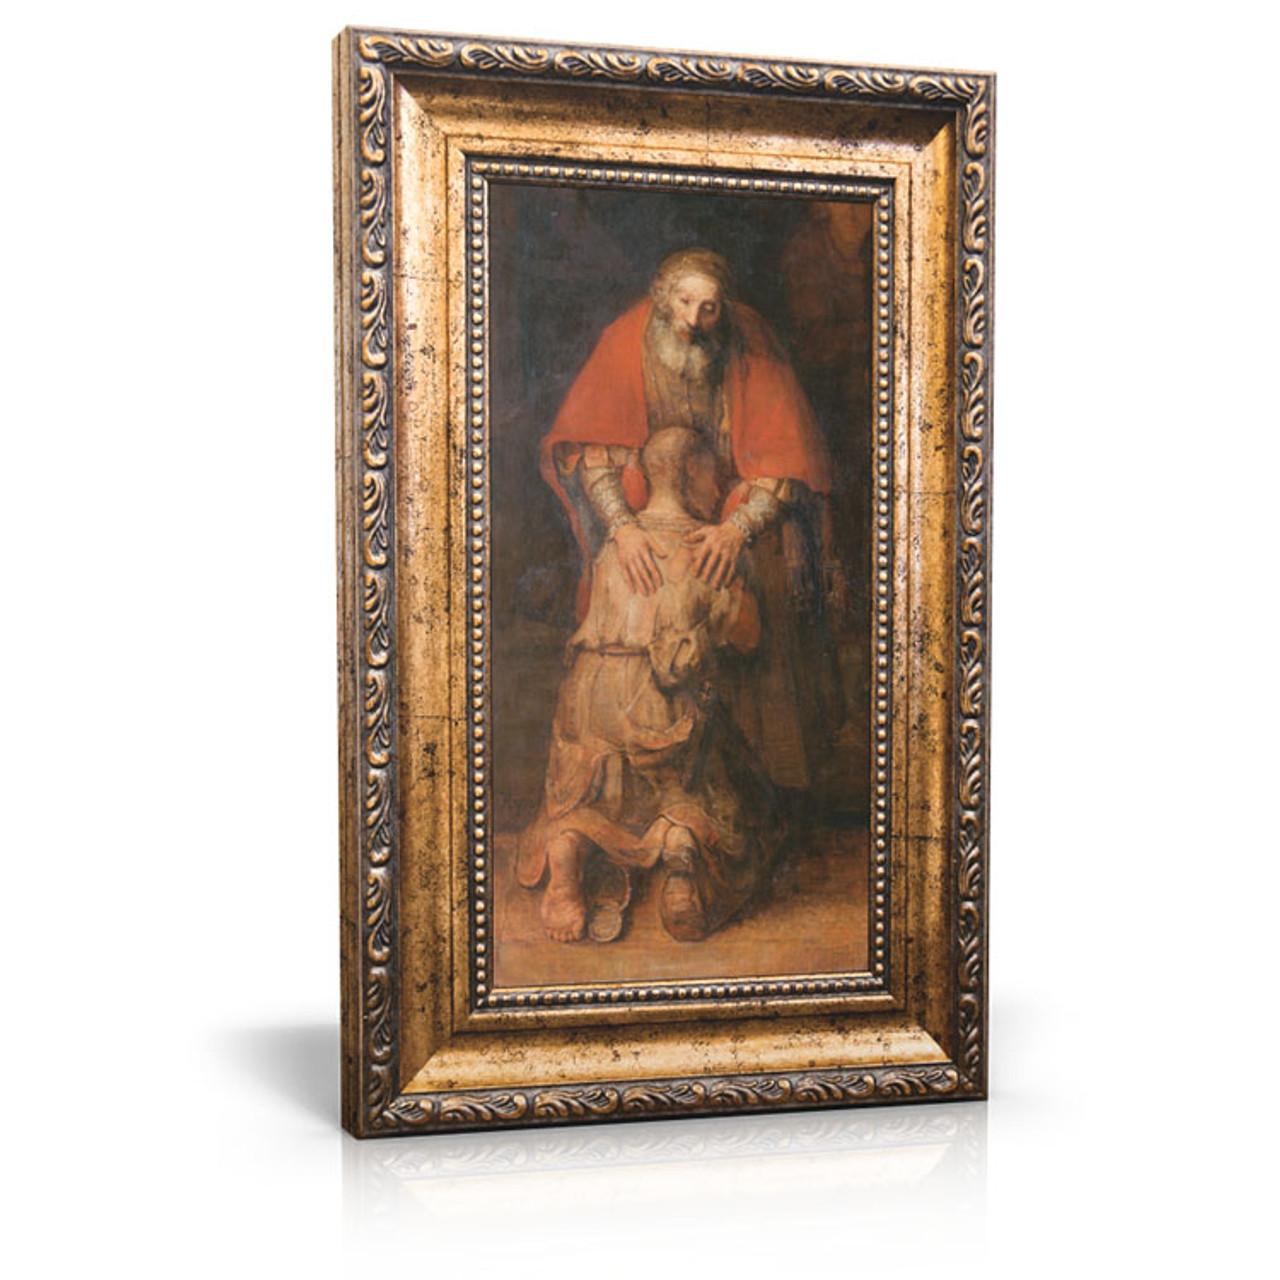 Rembrandt Return Of The Prodigal Son Framed Canvas 6 X 11 Including Frame 9 5 X 14 5 Cedar House